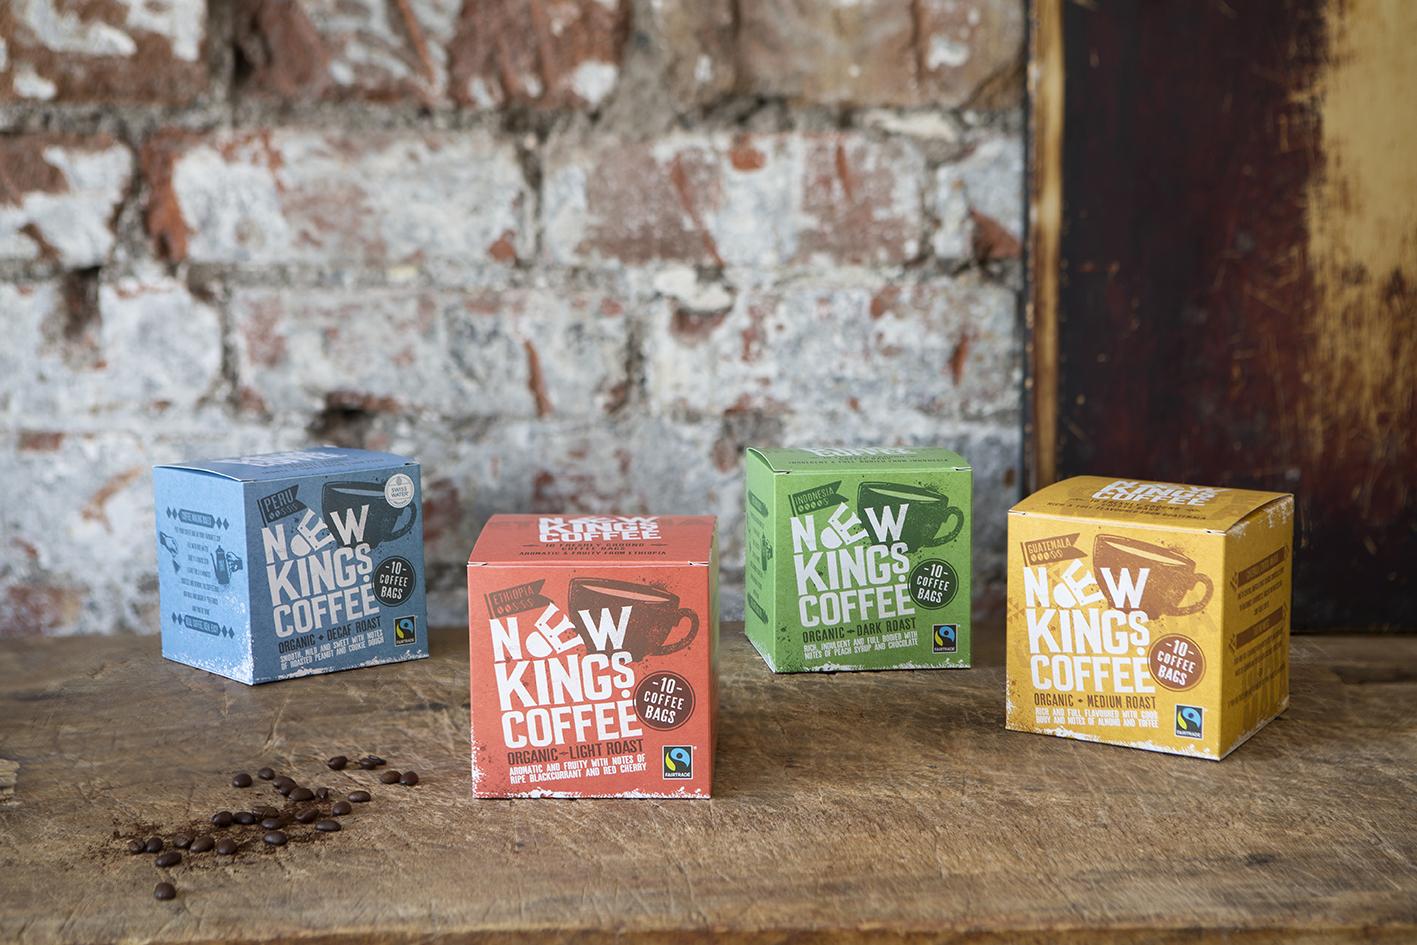 New-Kings-Coffee-Bags-Fairtrade-Organic-Selection-1.jpg